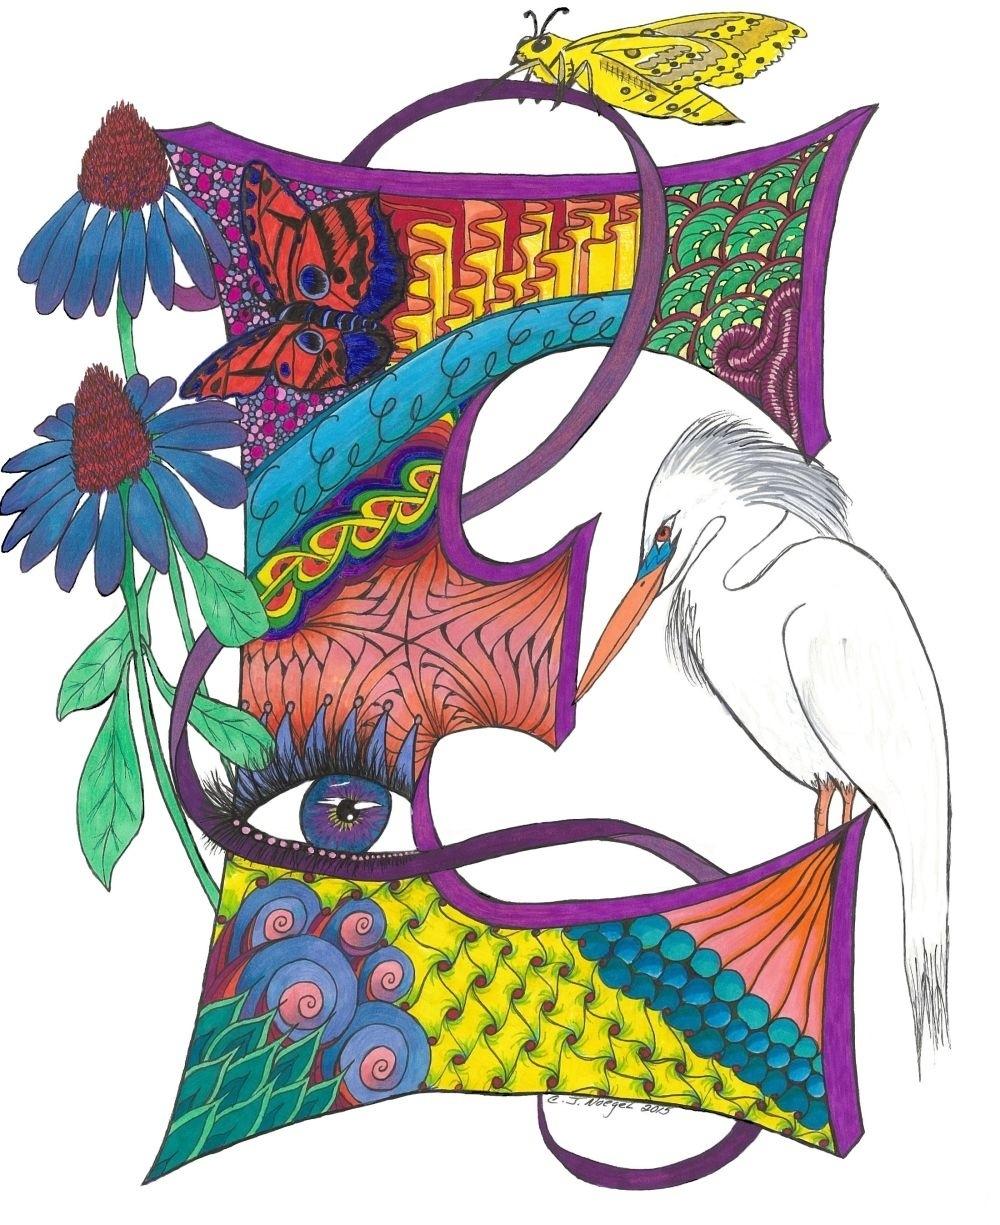 Elemental clipart decorative Art by Noegel created Elemental